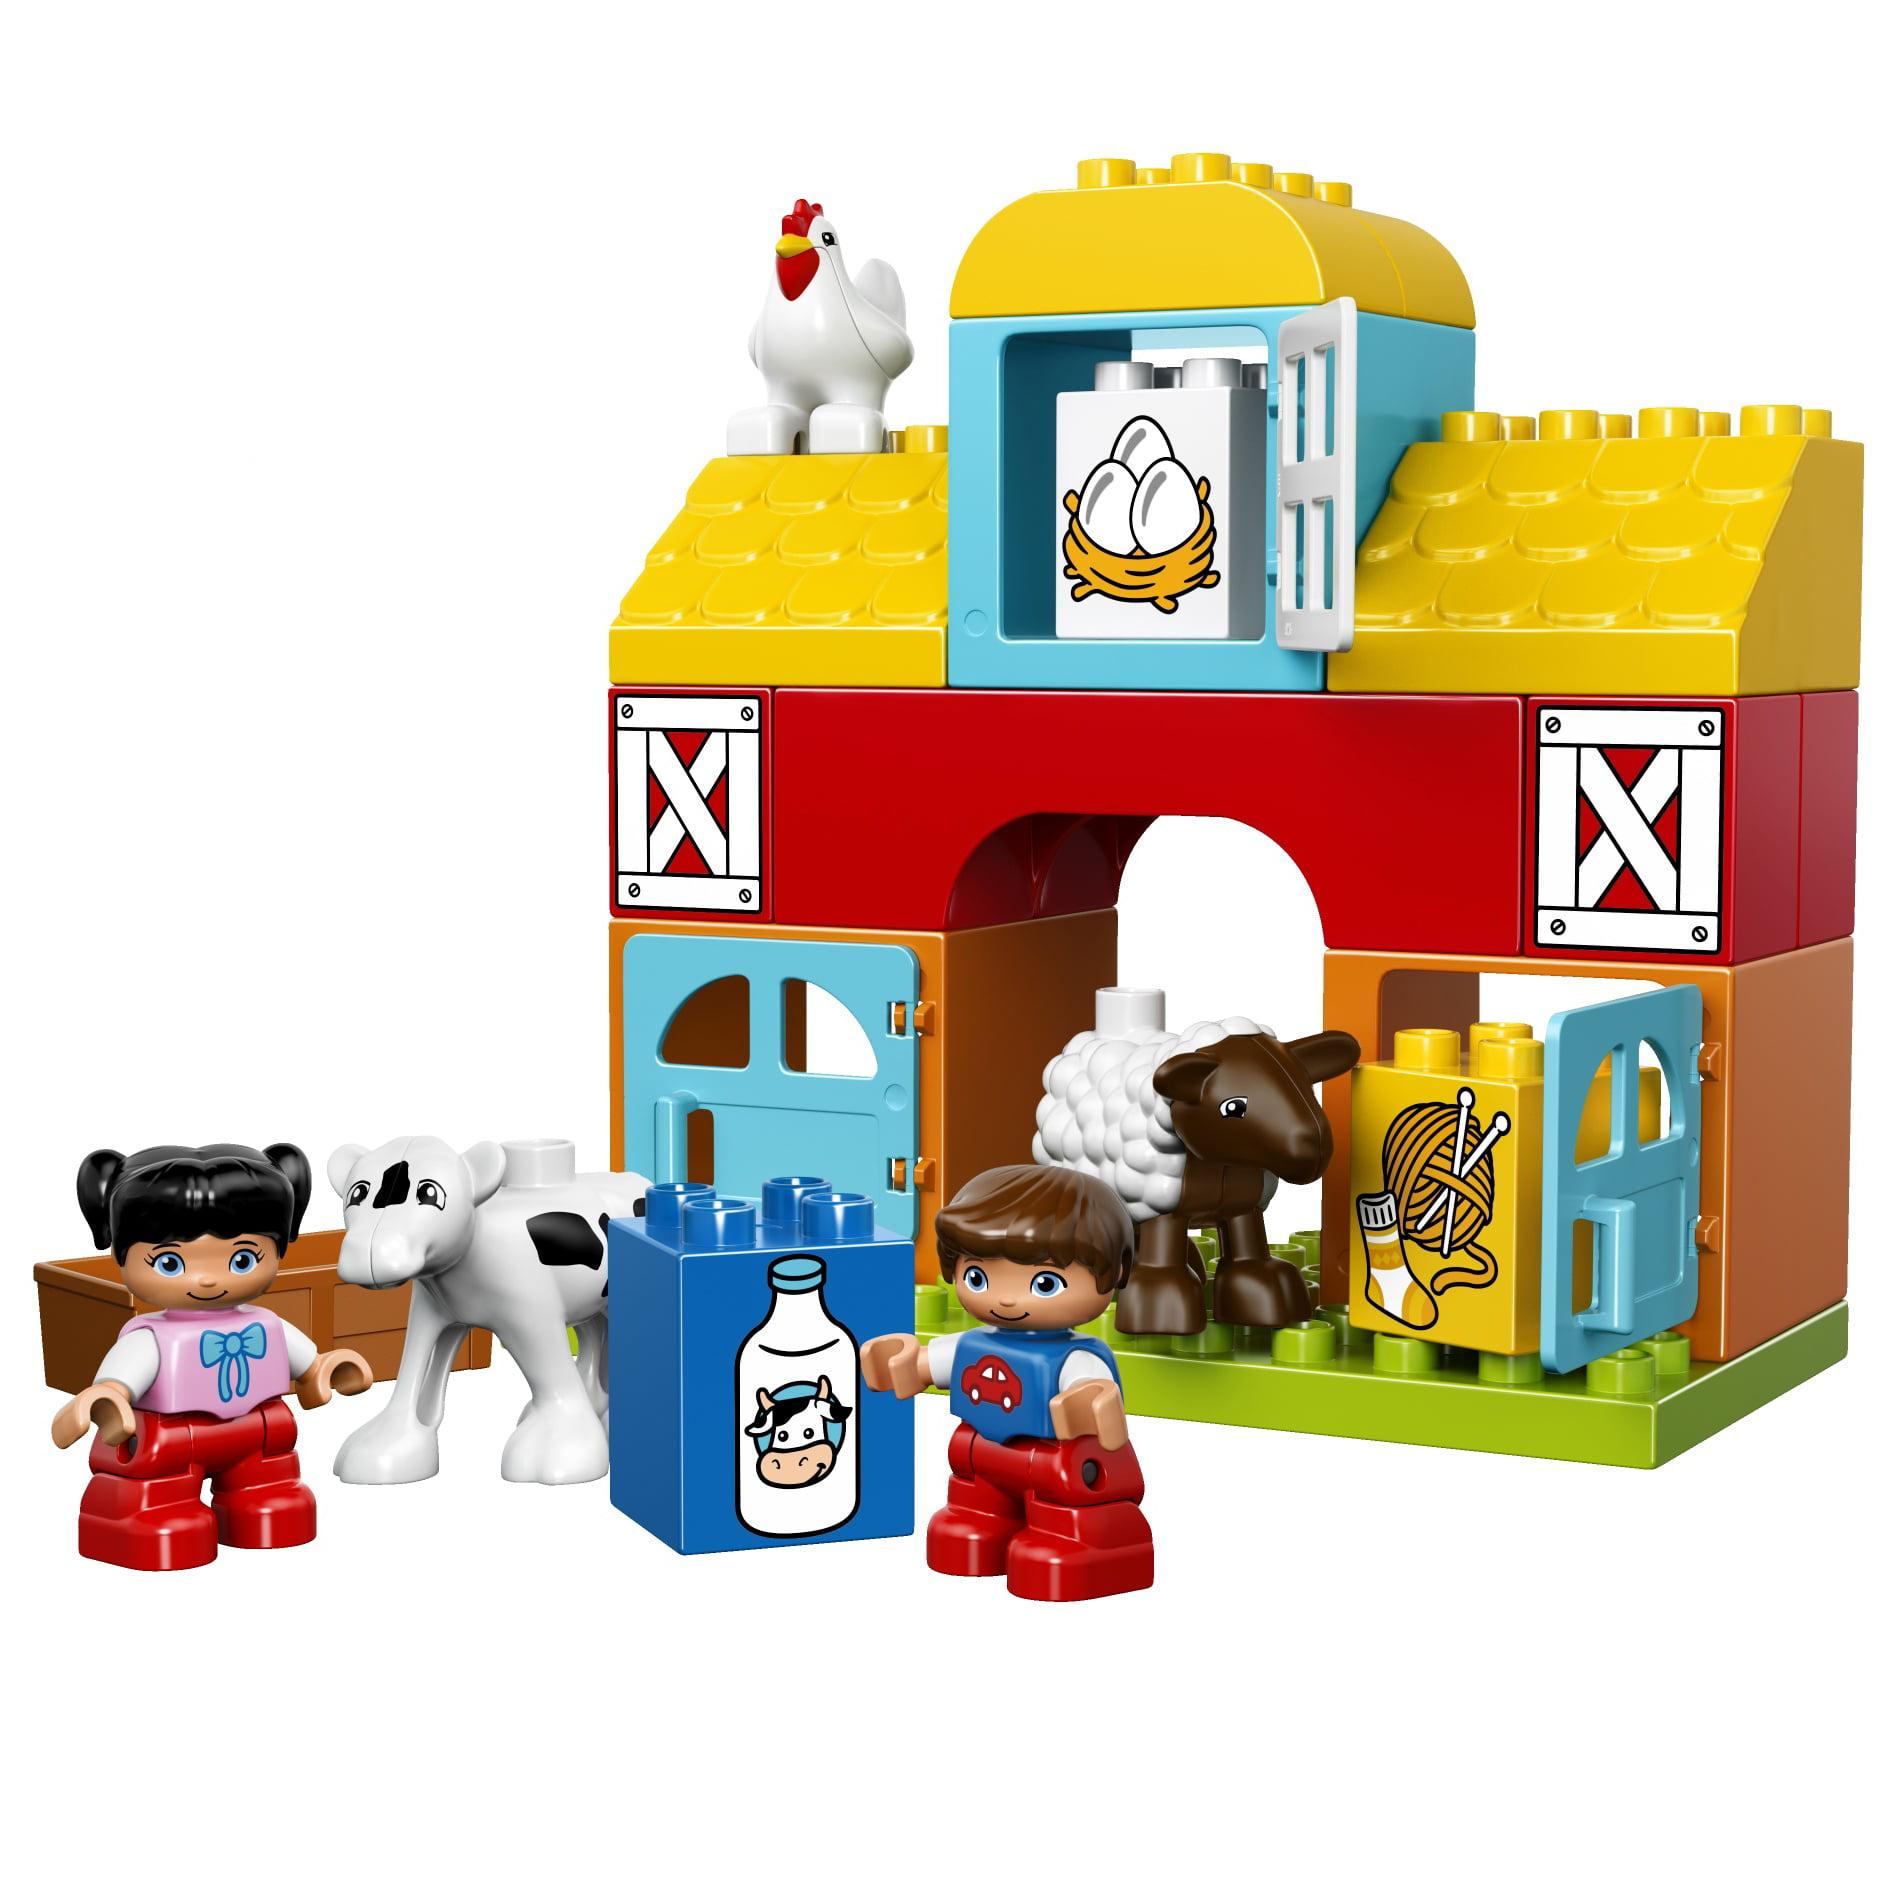 Lego Duplo My First Farm and Animals Building Blocks, 26 ...